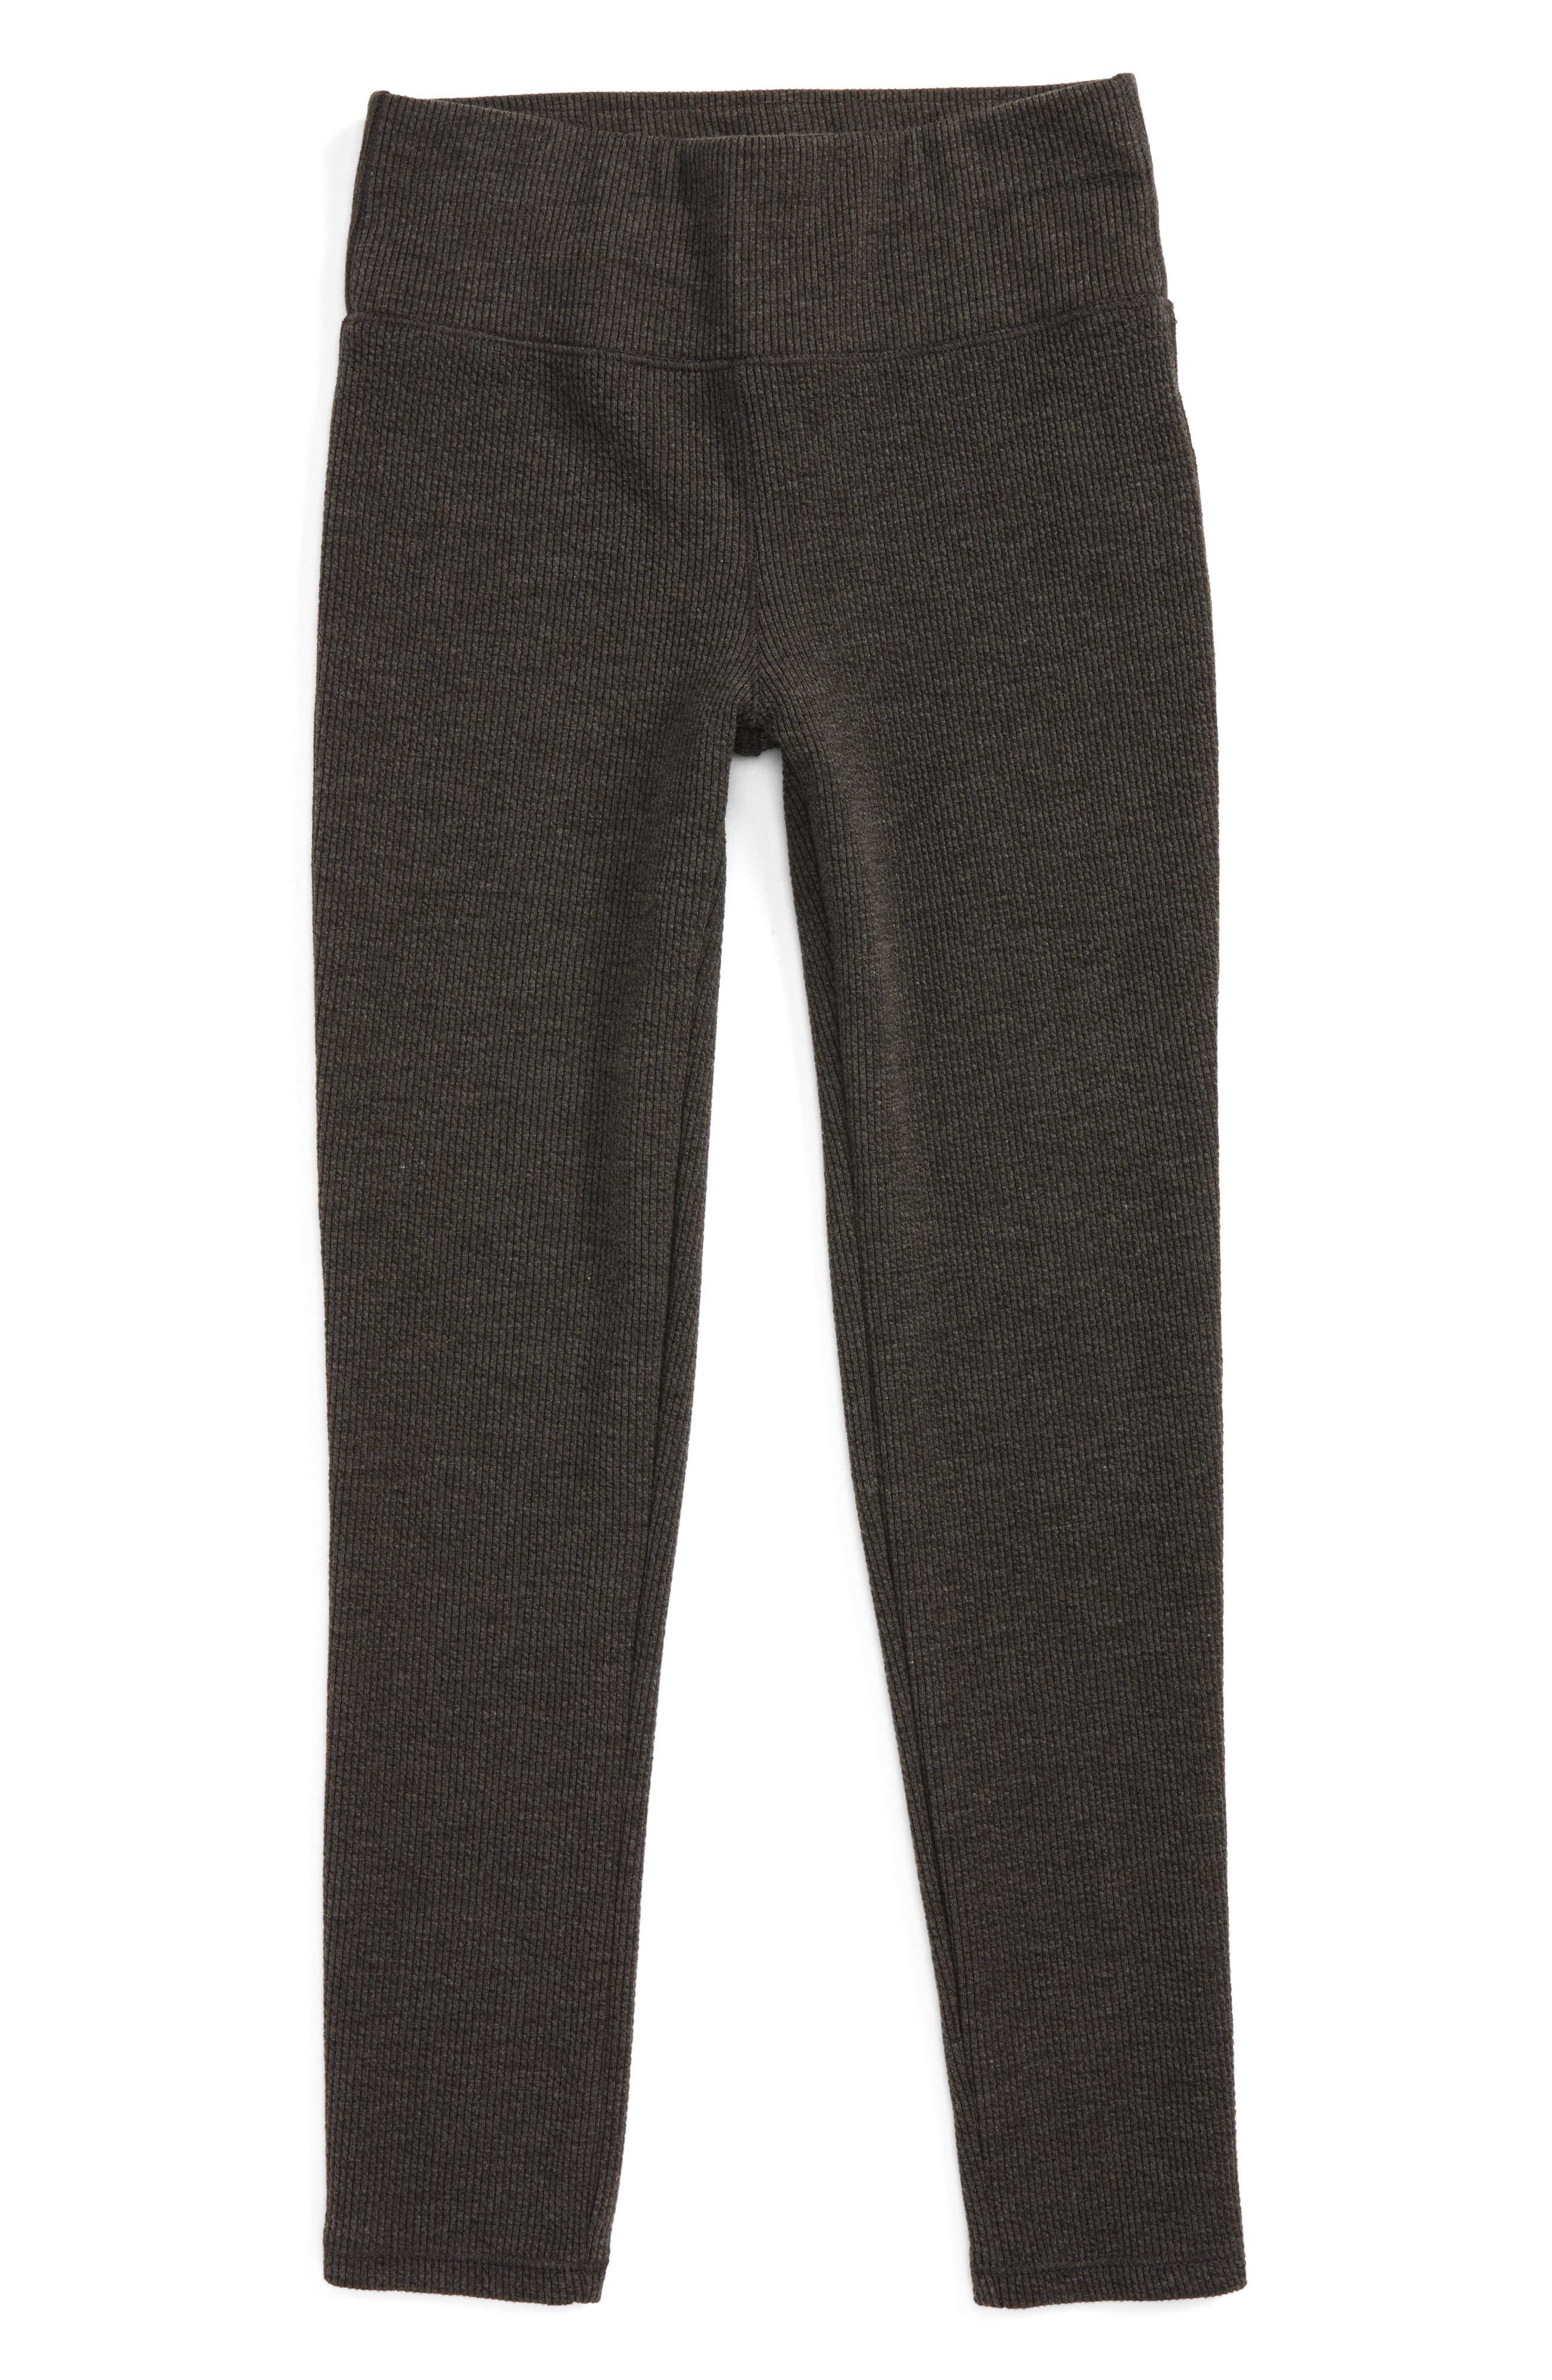 Rib Knit Leggings,                         Main,                         color, 020